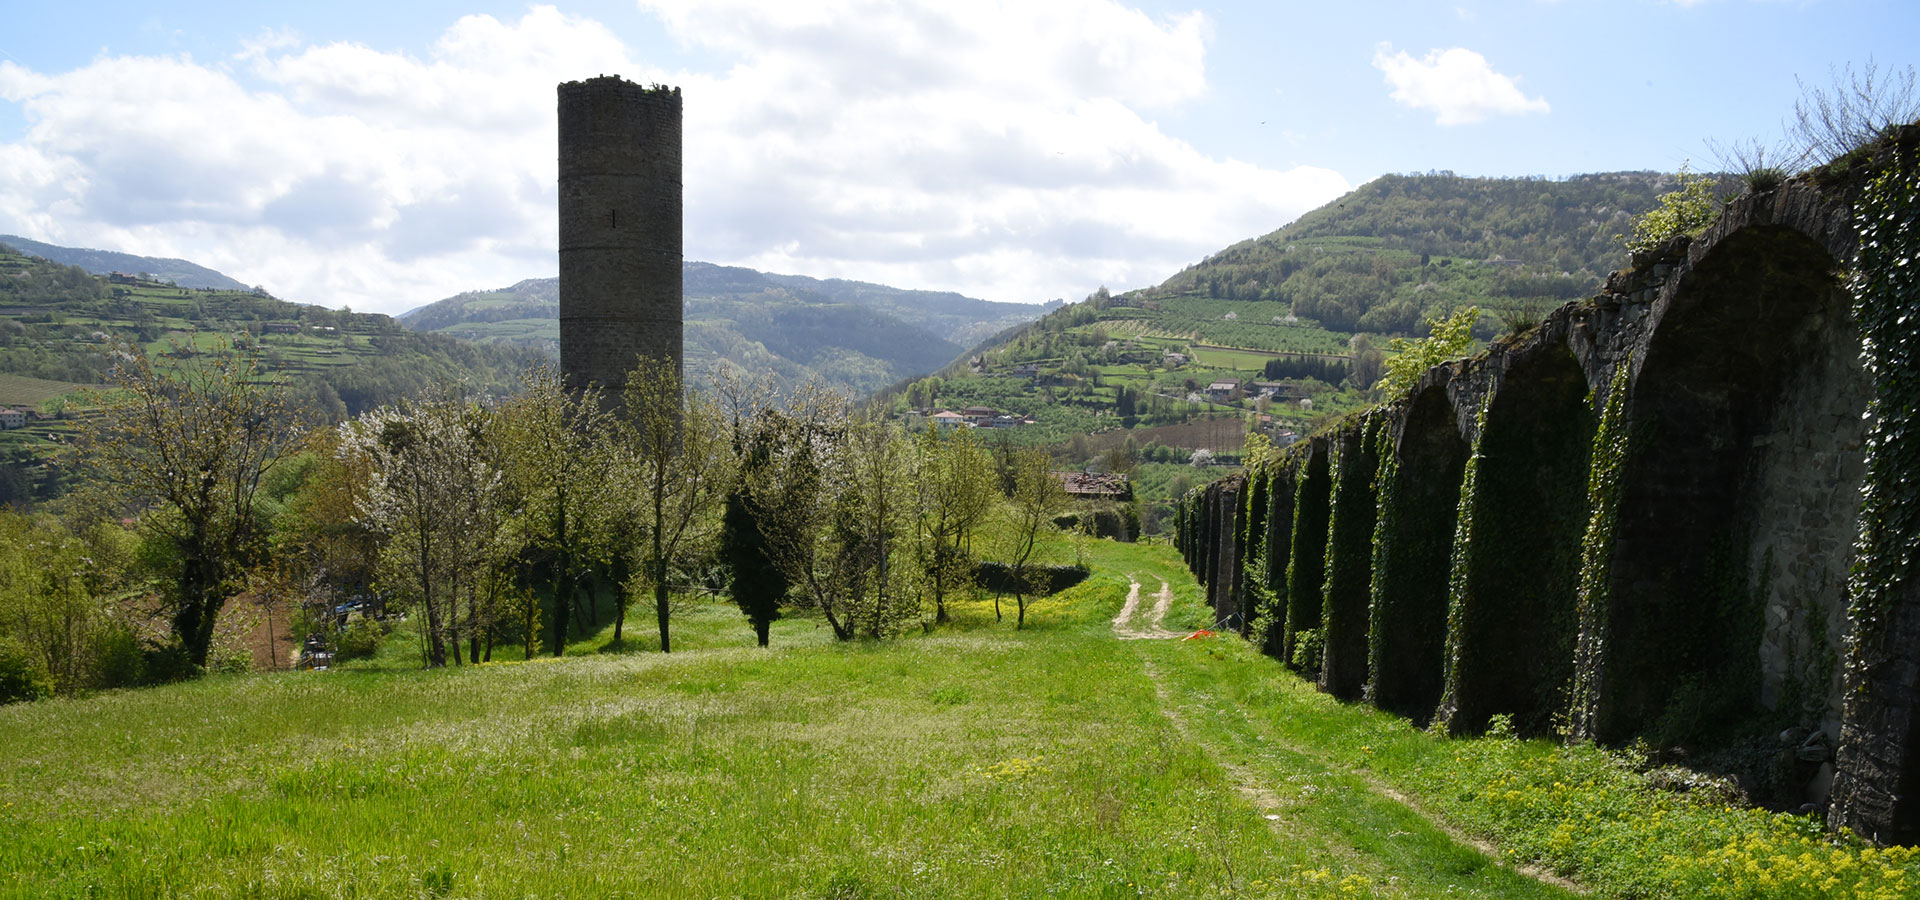 Torre-di-cortemilia-4